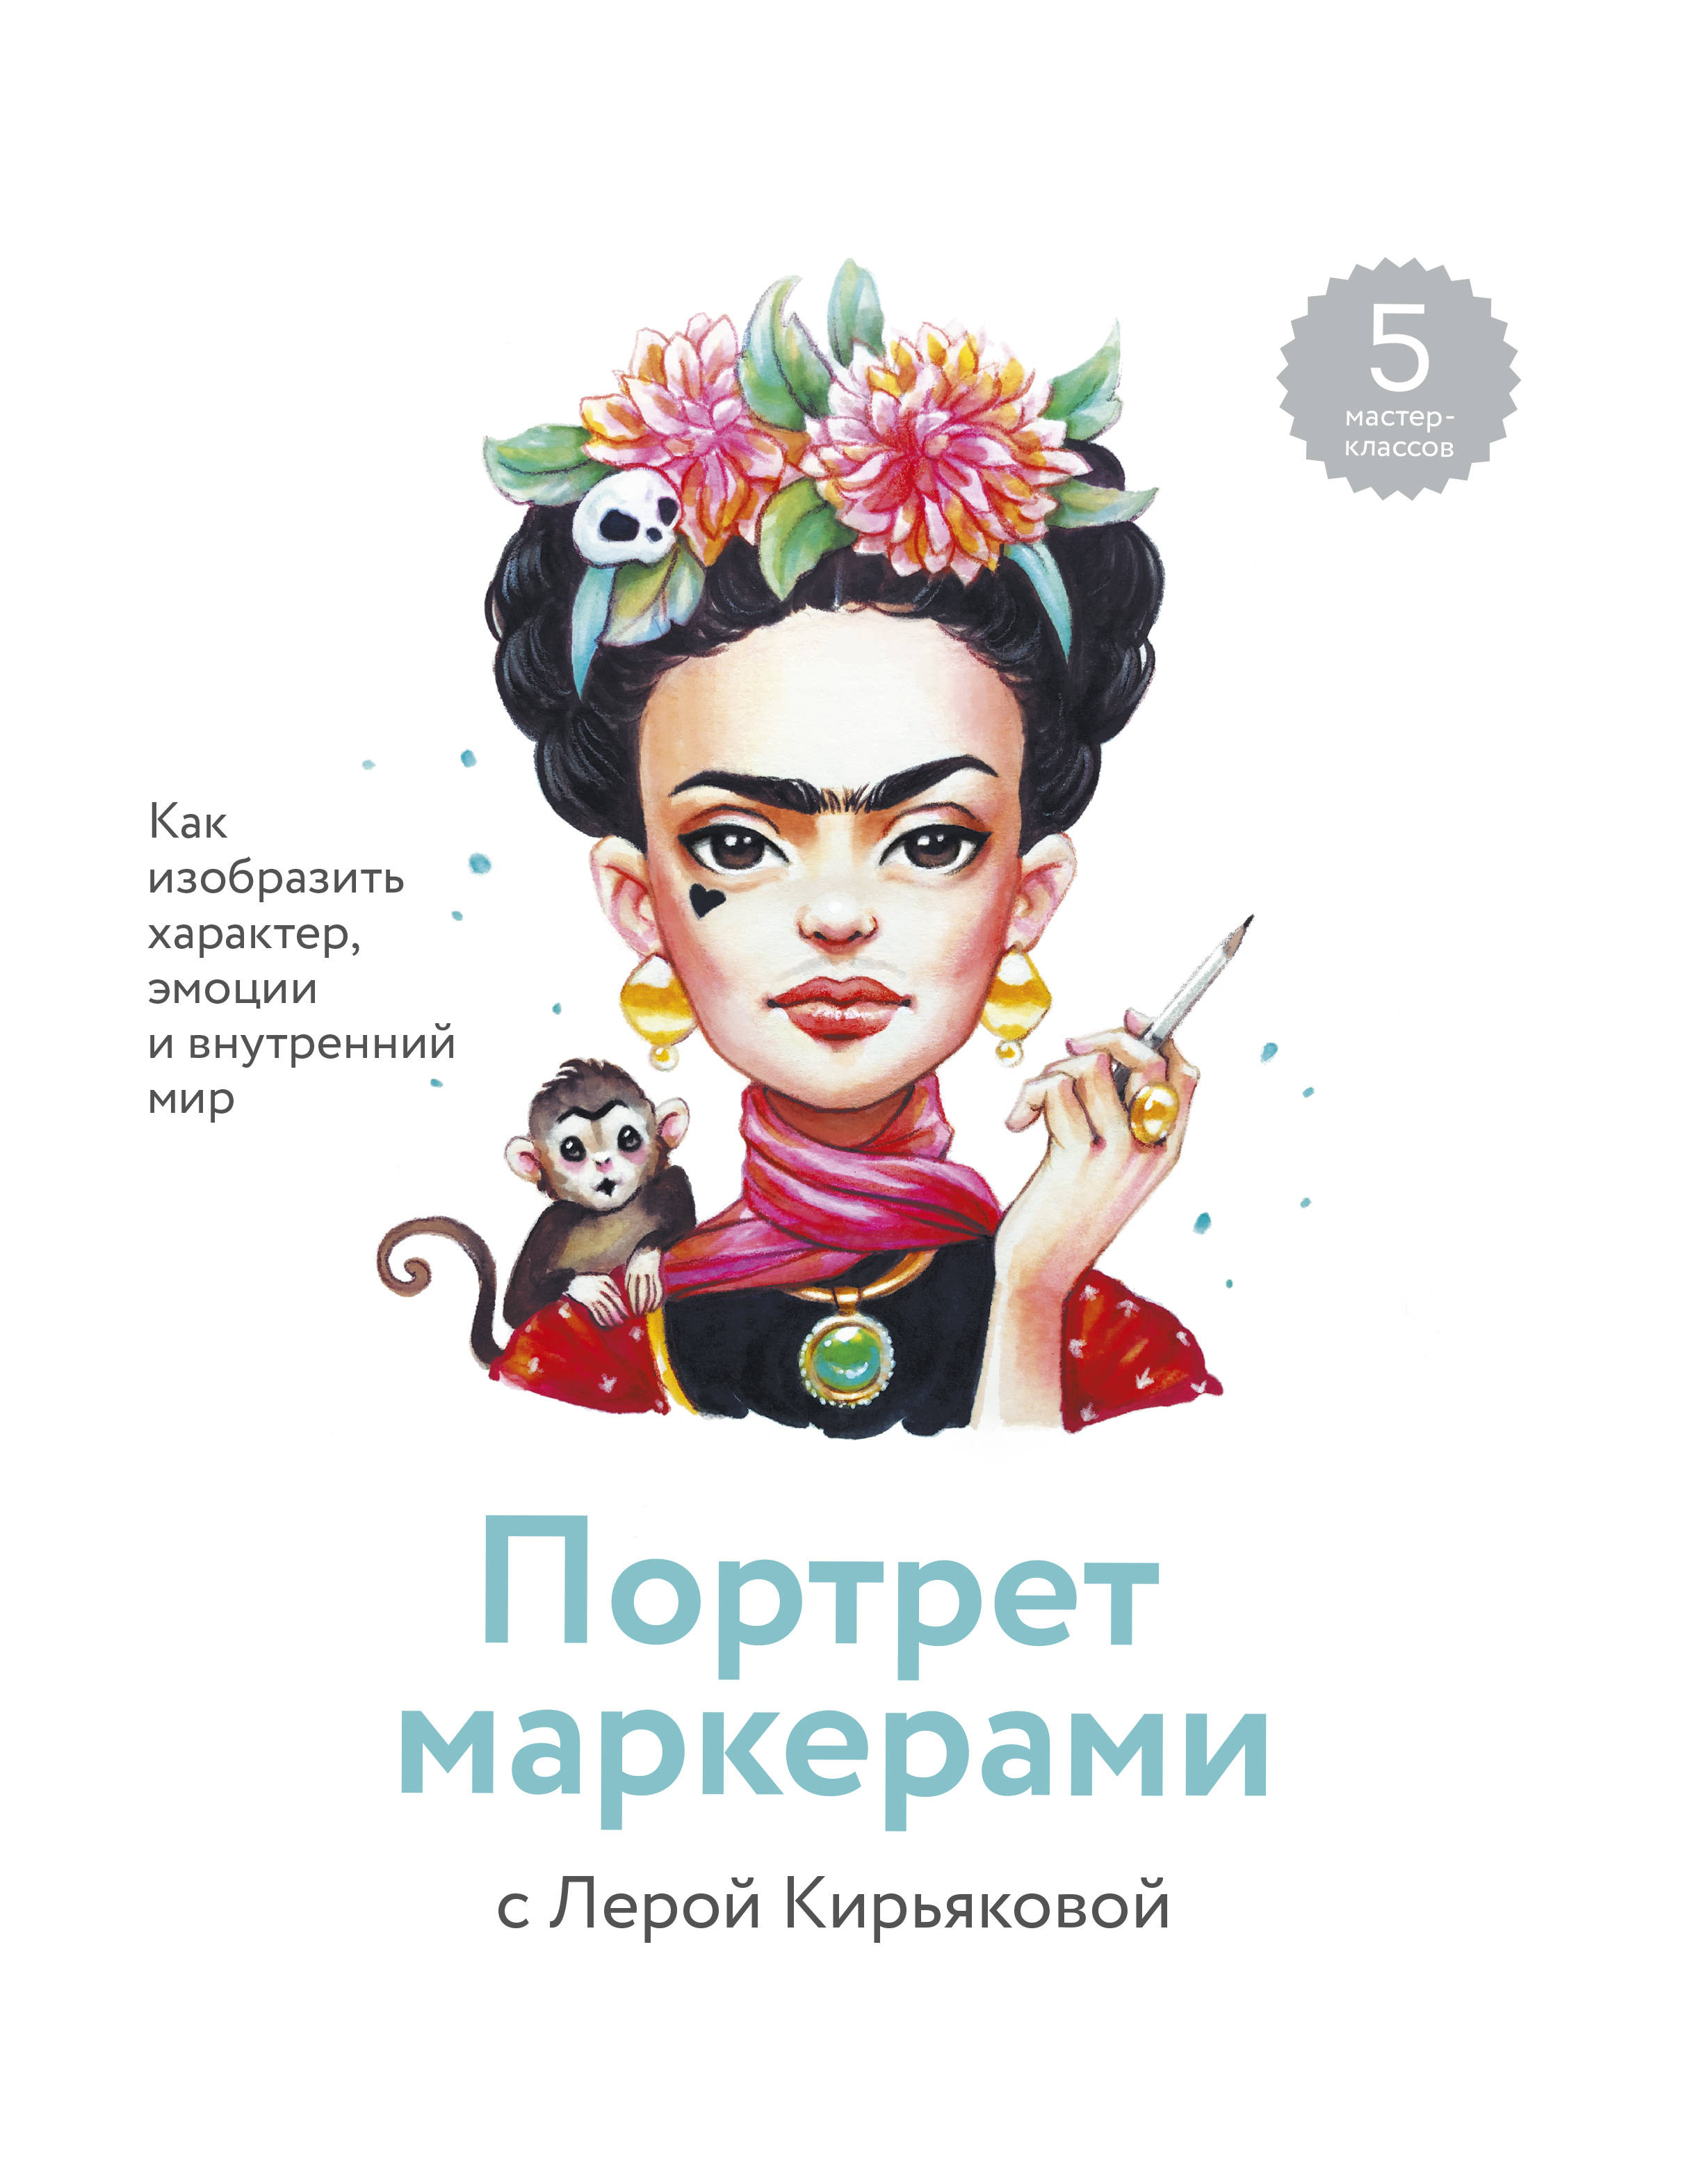 Portret markerami s Leroj Kirjakovoj. Kak izobrazit kharakter, emotsii i vnutrennij mir. 7 master-kla